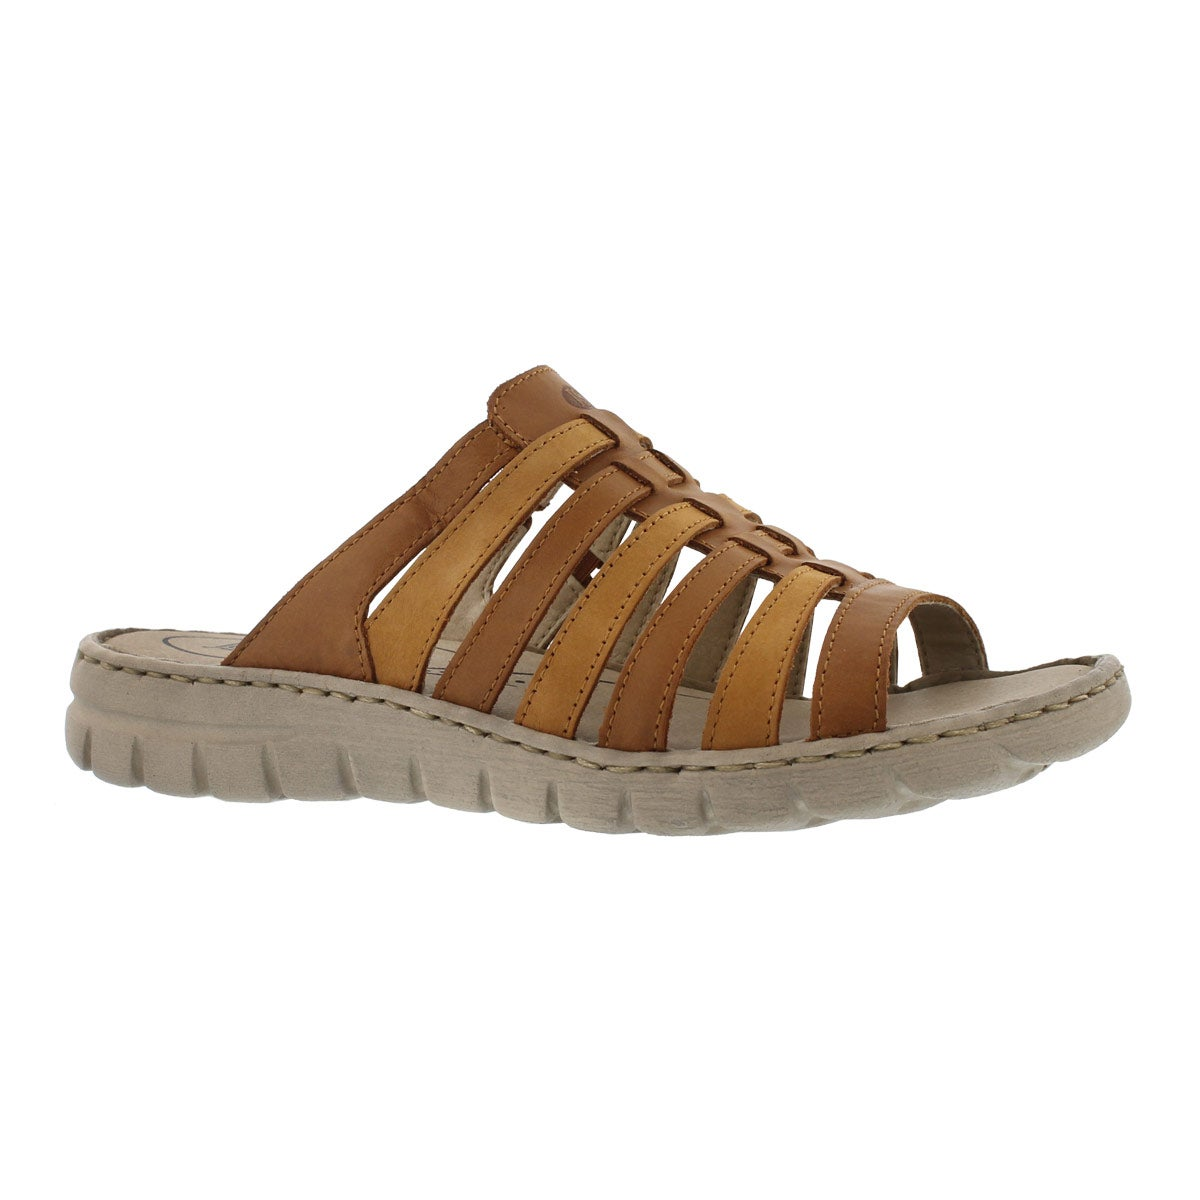 Women's STEFANIE 05 camel casual sandals